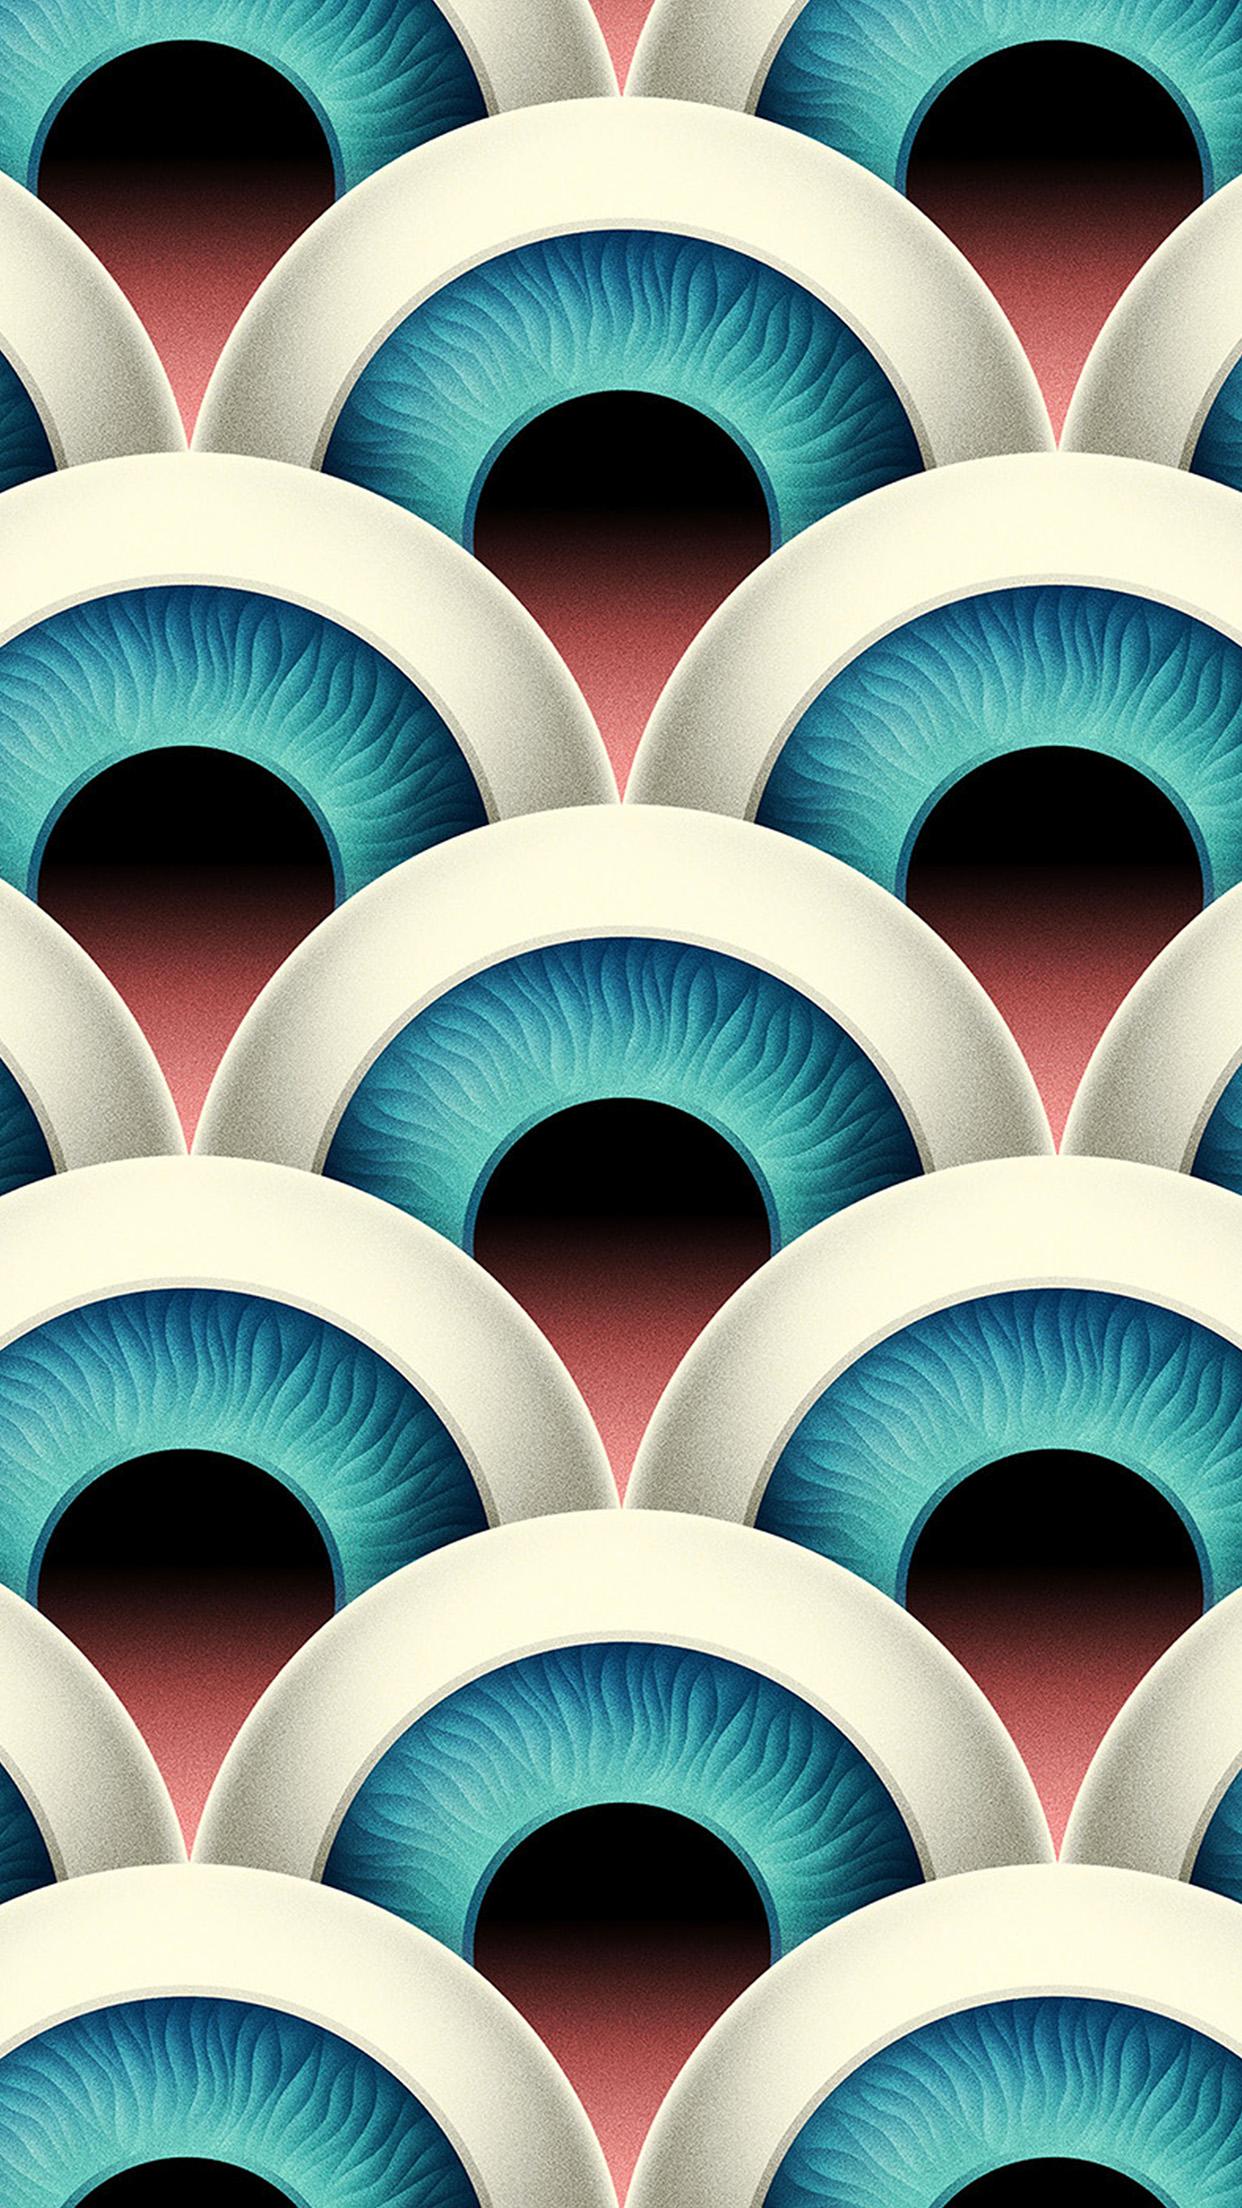 iPhone Duvar Kağıdı-vz57-eye-duplicate-pattern-background-iphone-plus-wallpaper